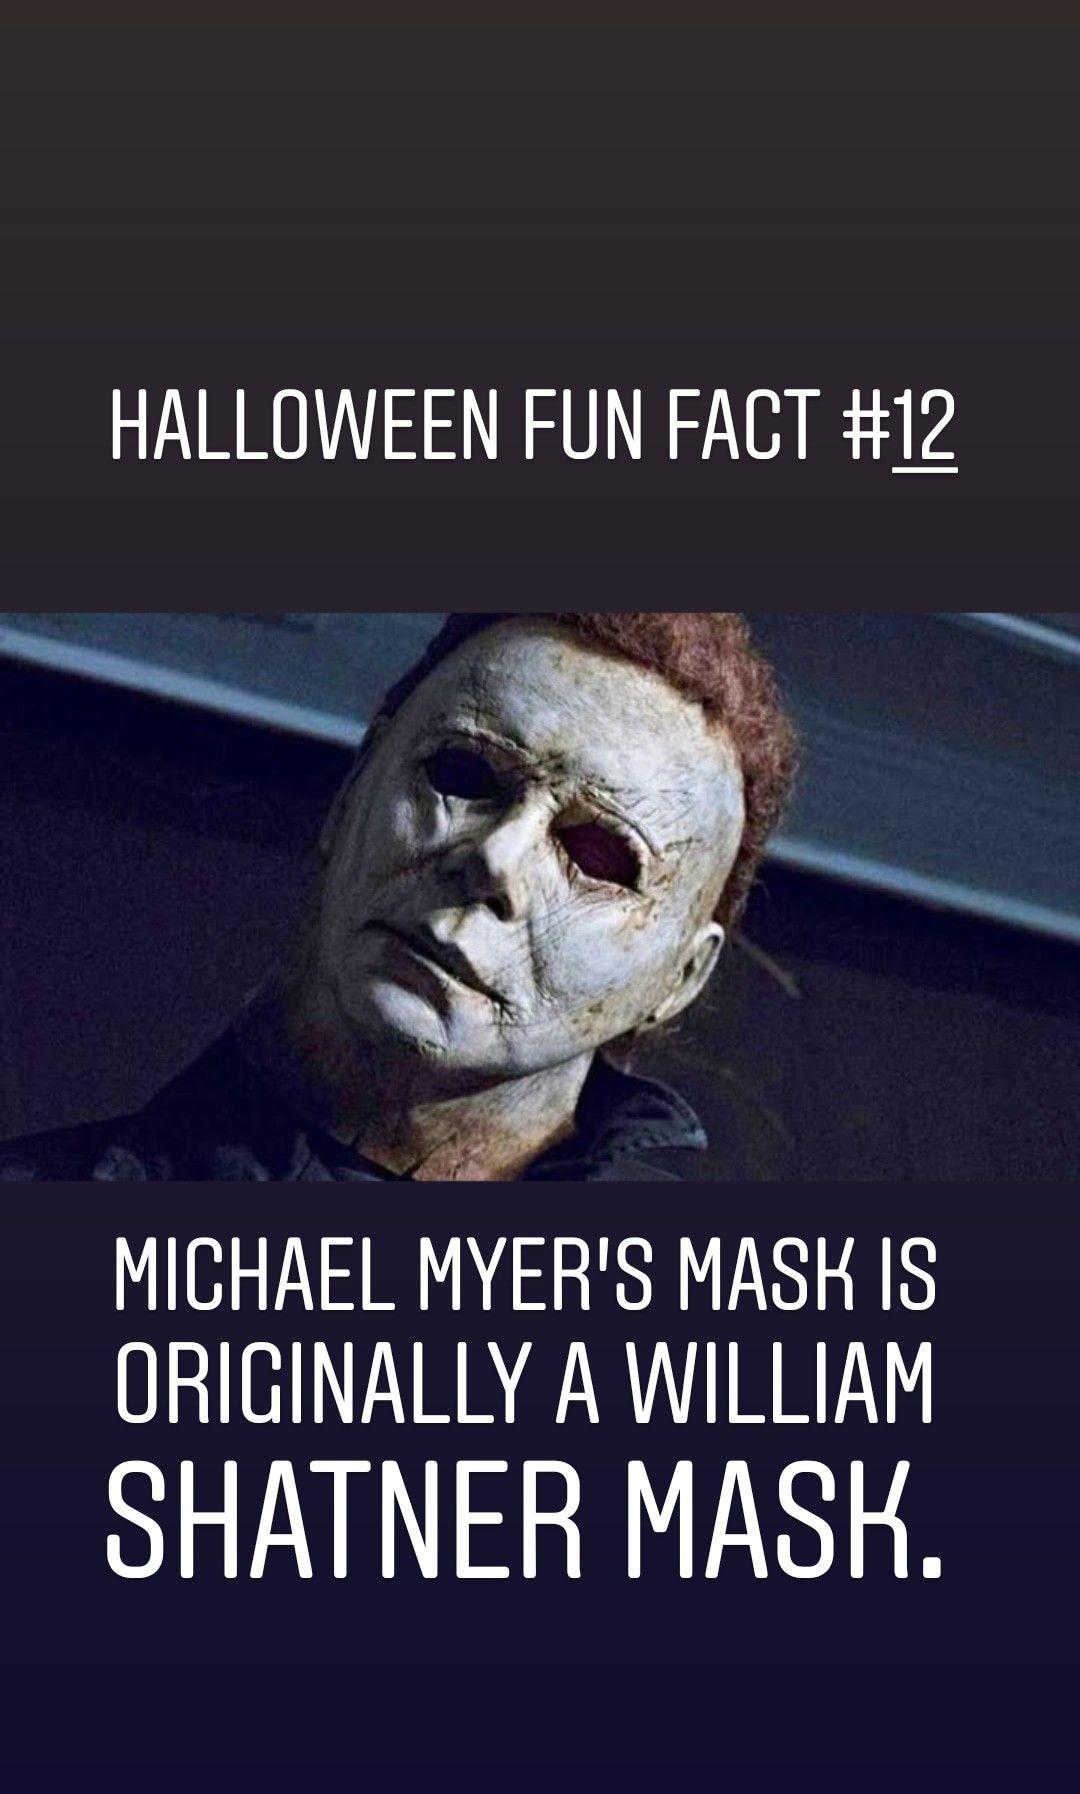 21 Cool Halloween Facts Halloween facts, Halloween fun